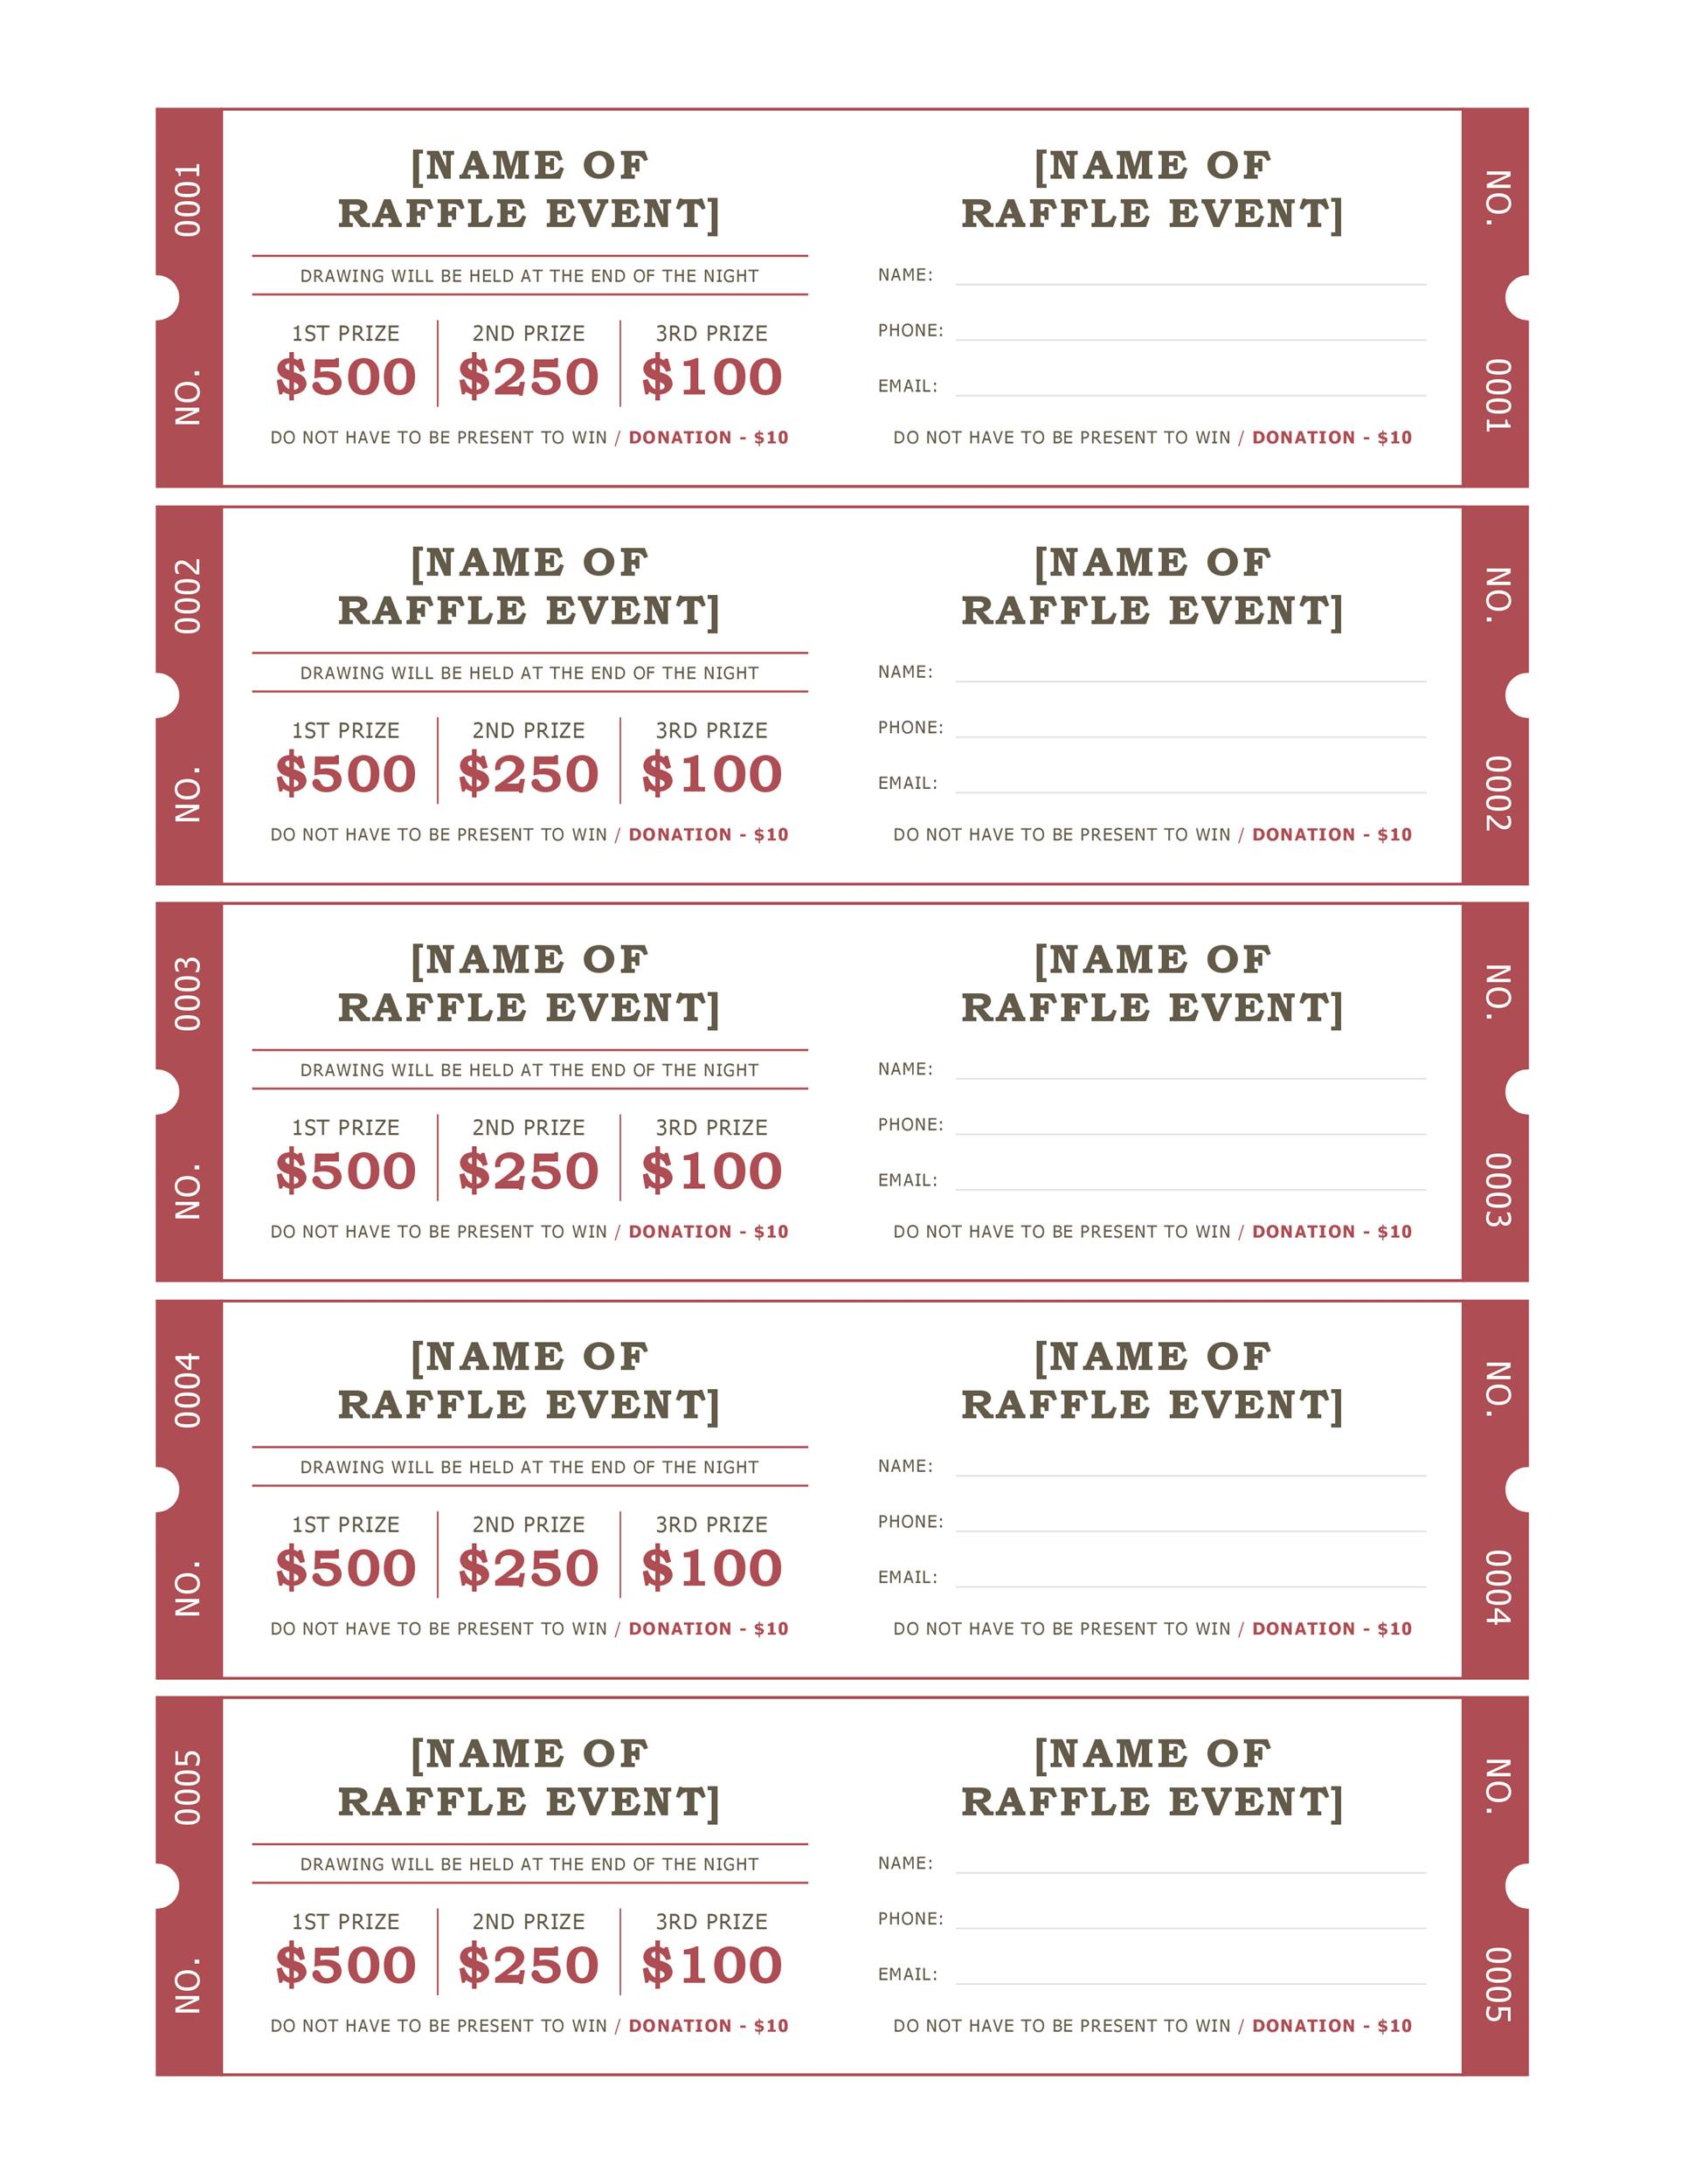 Free Raffle Ticket Templates 10